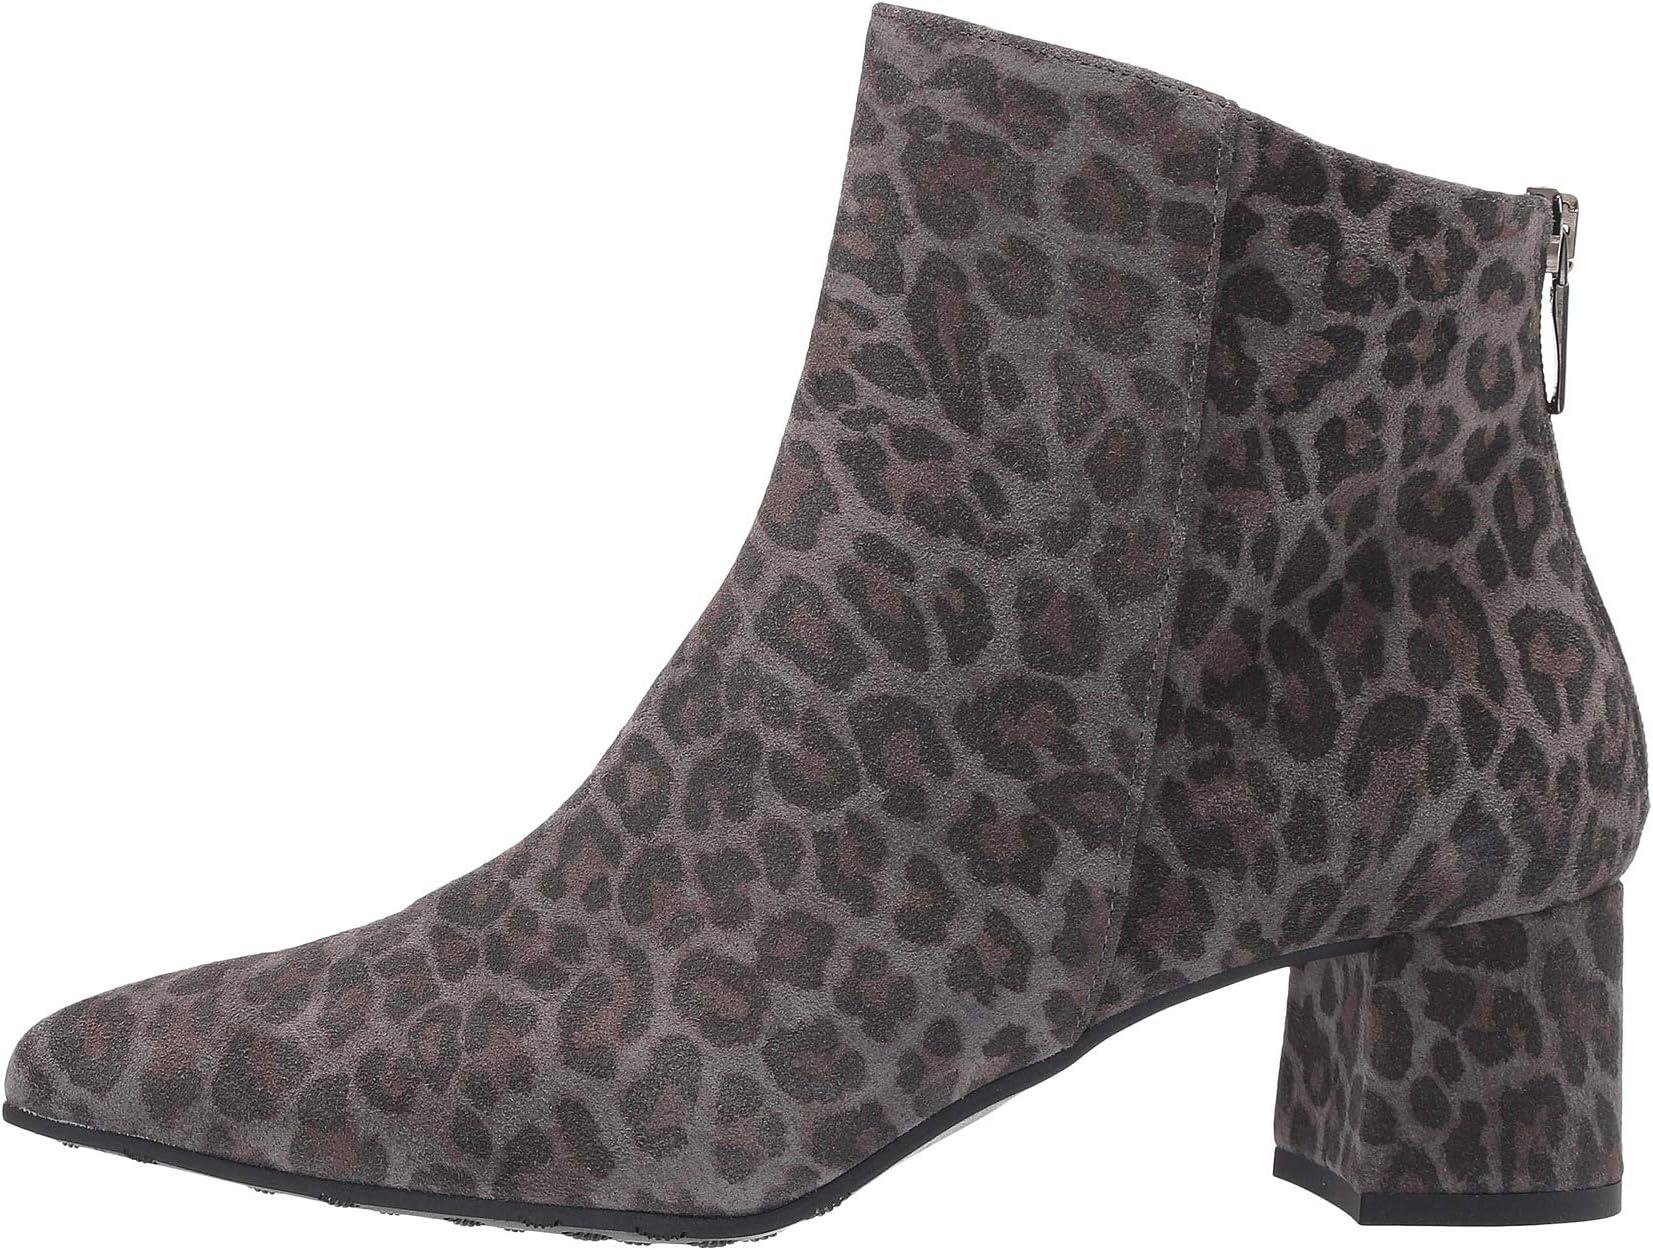 Cordani Queenie | Women's shoes | 2020 Newest